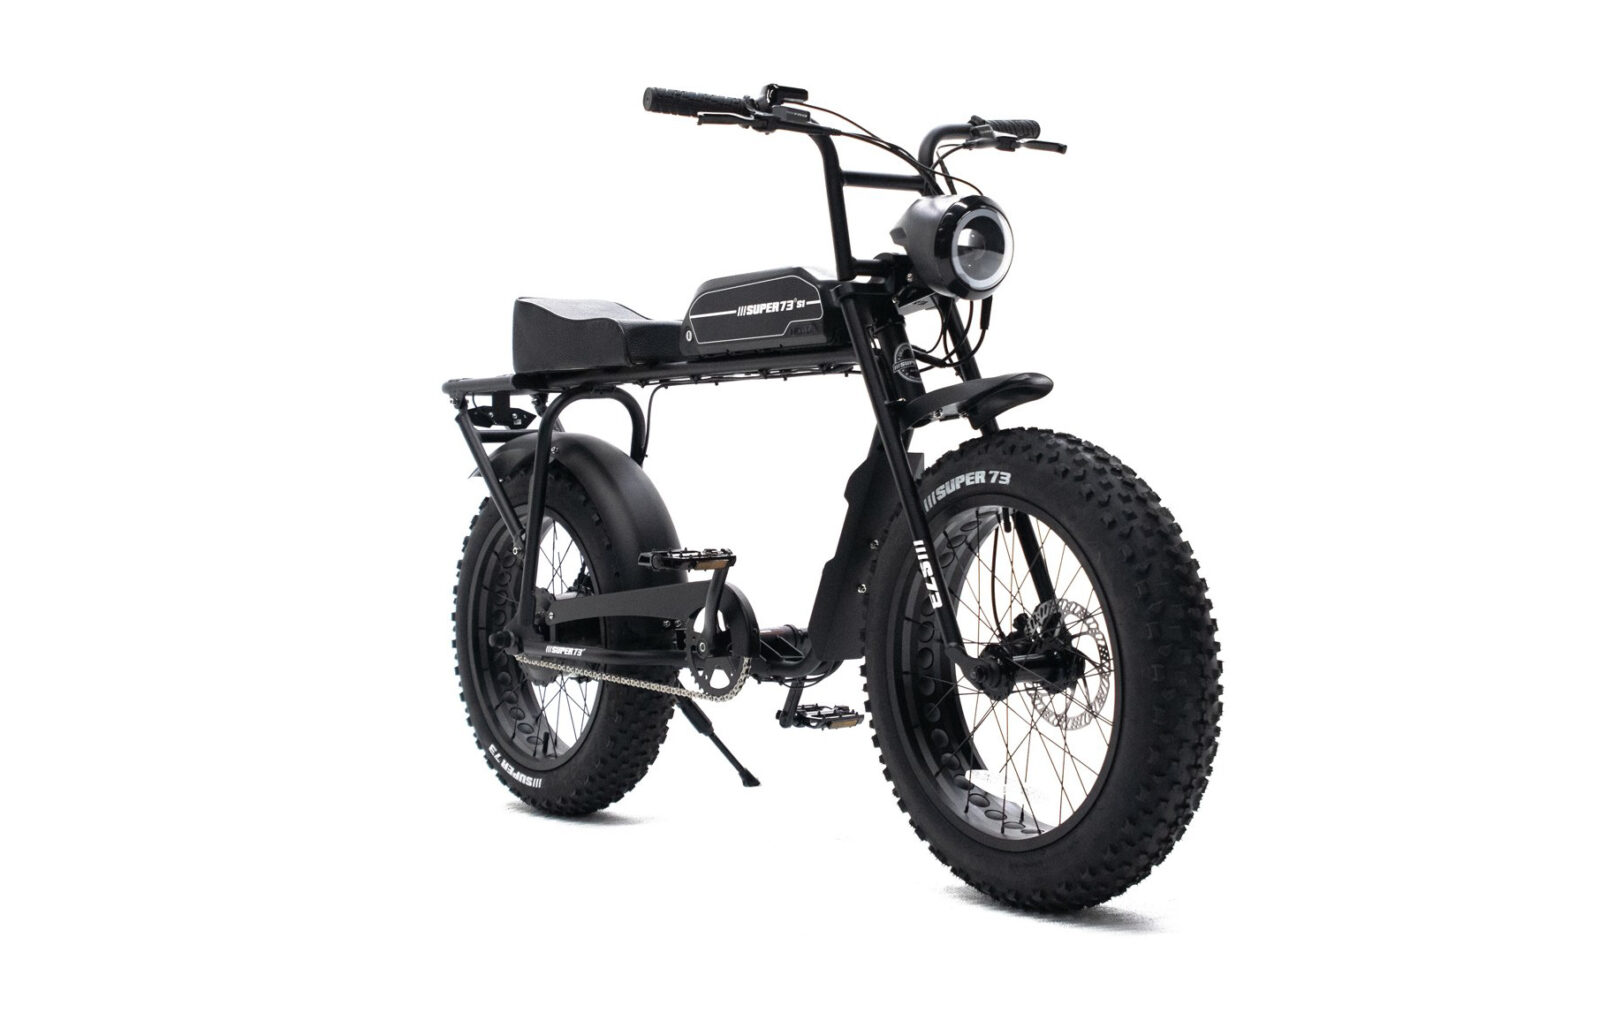 Super73-S1 Universal Motorbike